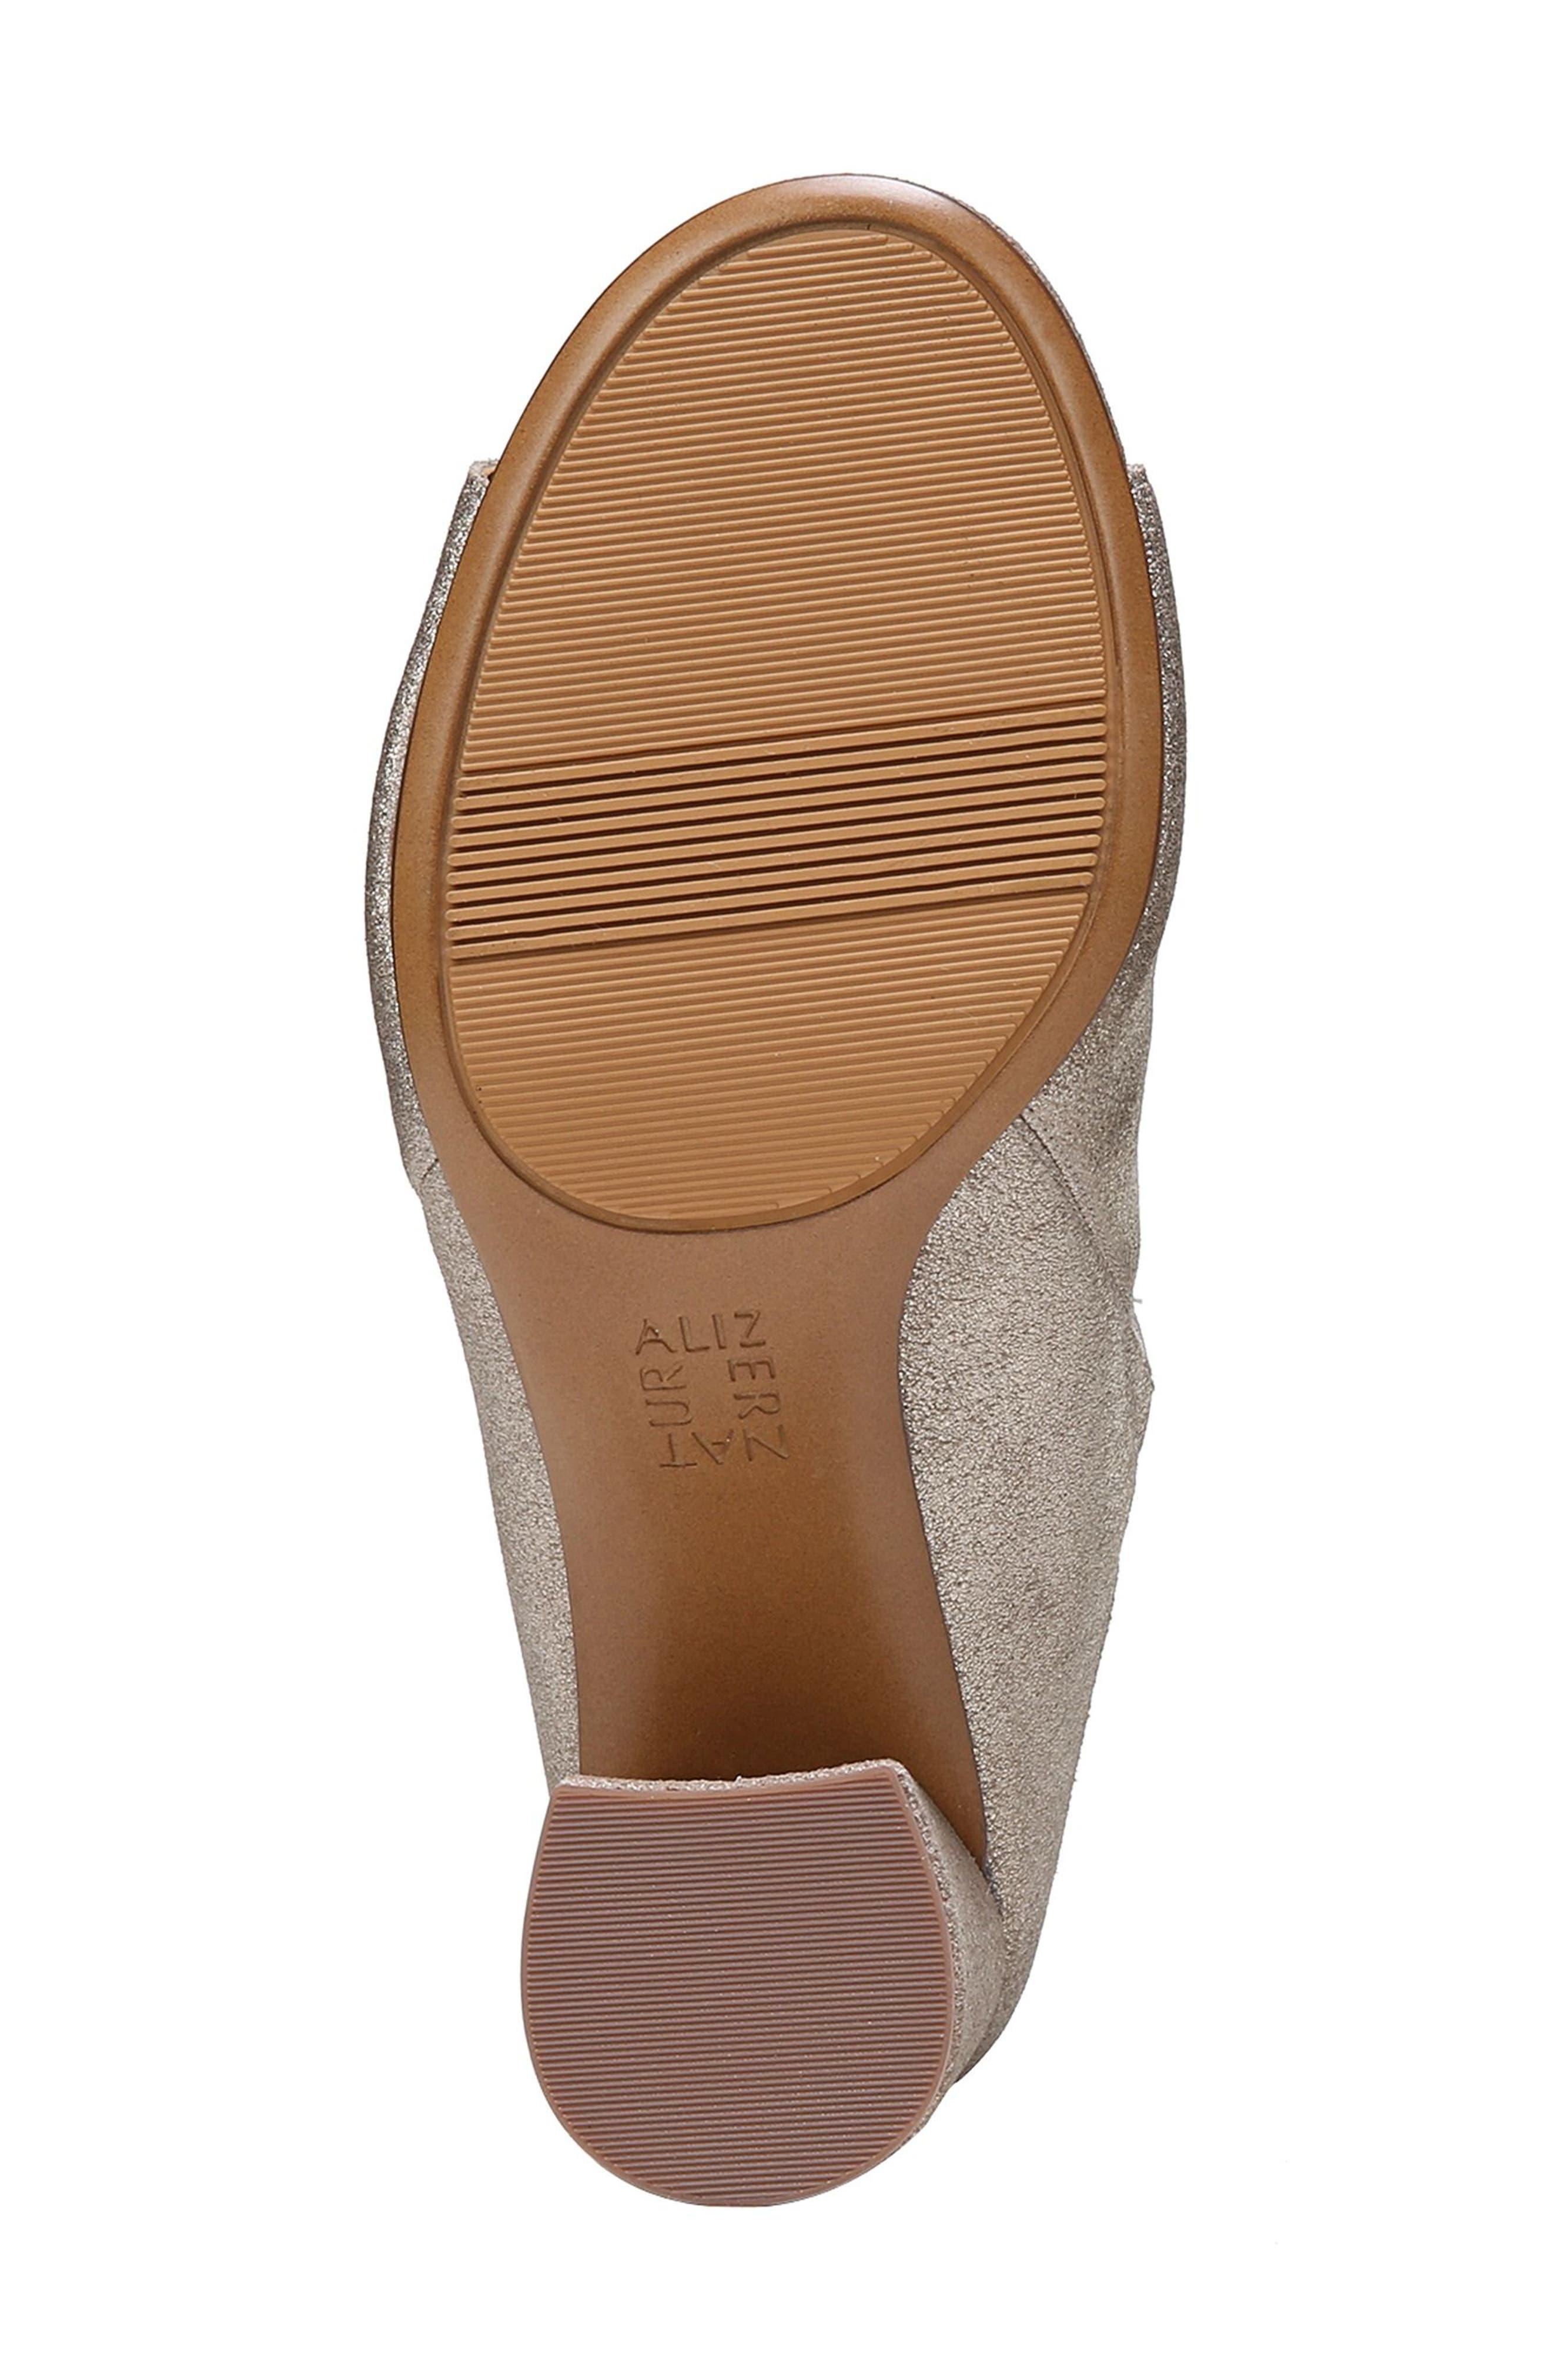 Cyprine Slide Sandal,                             Alternate thumbnail 6, color,                             Champagne Suede